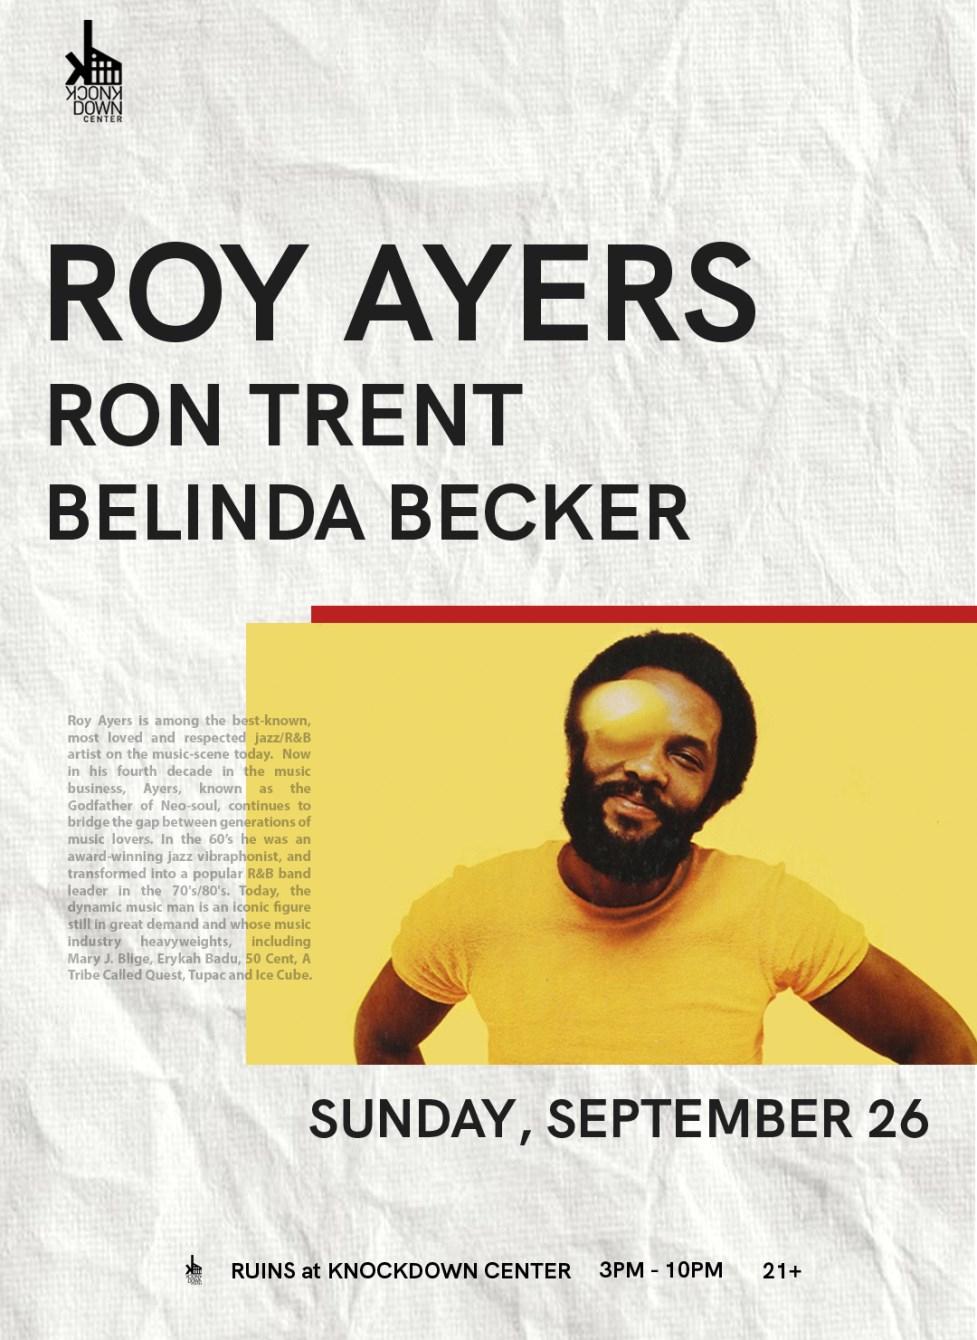 Roy Ayers (Live), Ron Trent, Belinda Becker - Flyer front